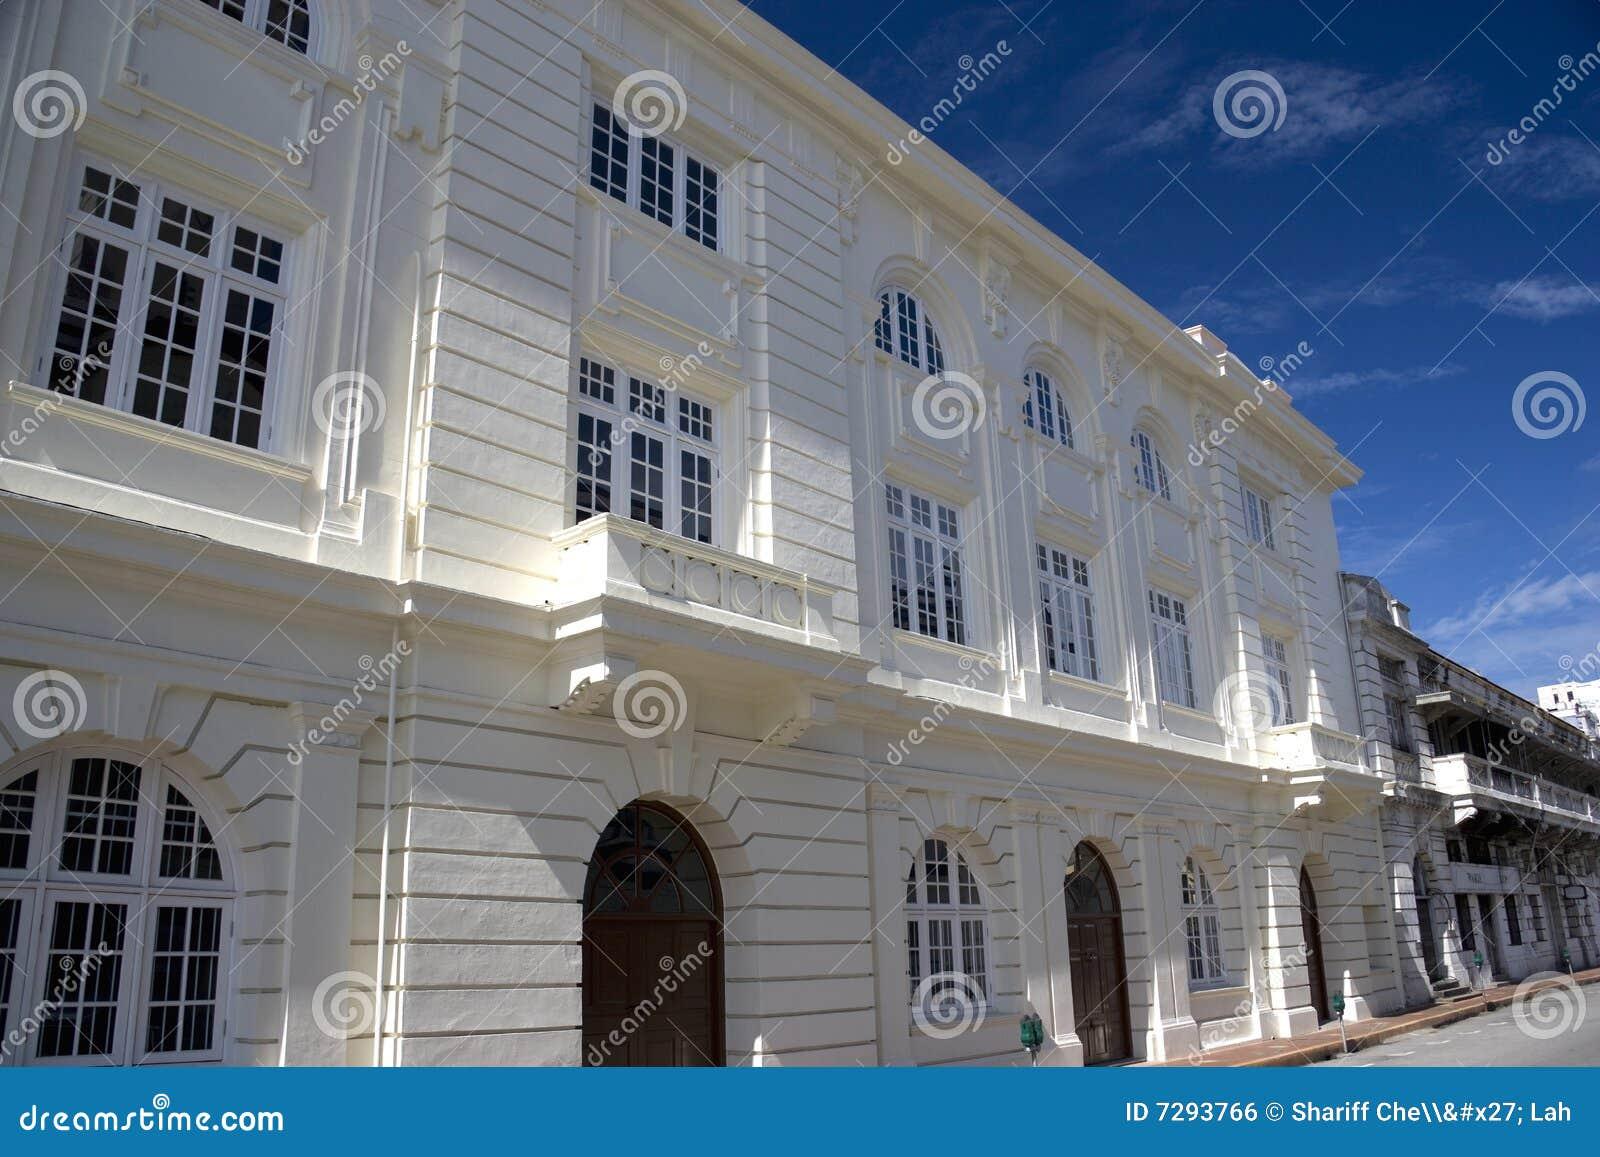 George Town Heritage Buildings Royalty Free Stock Image